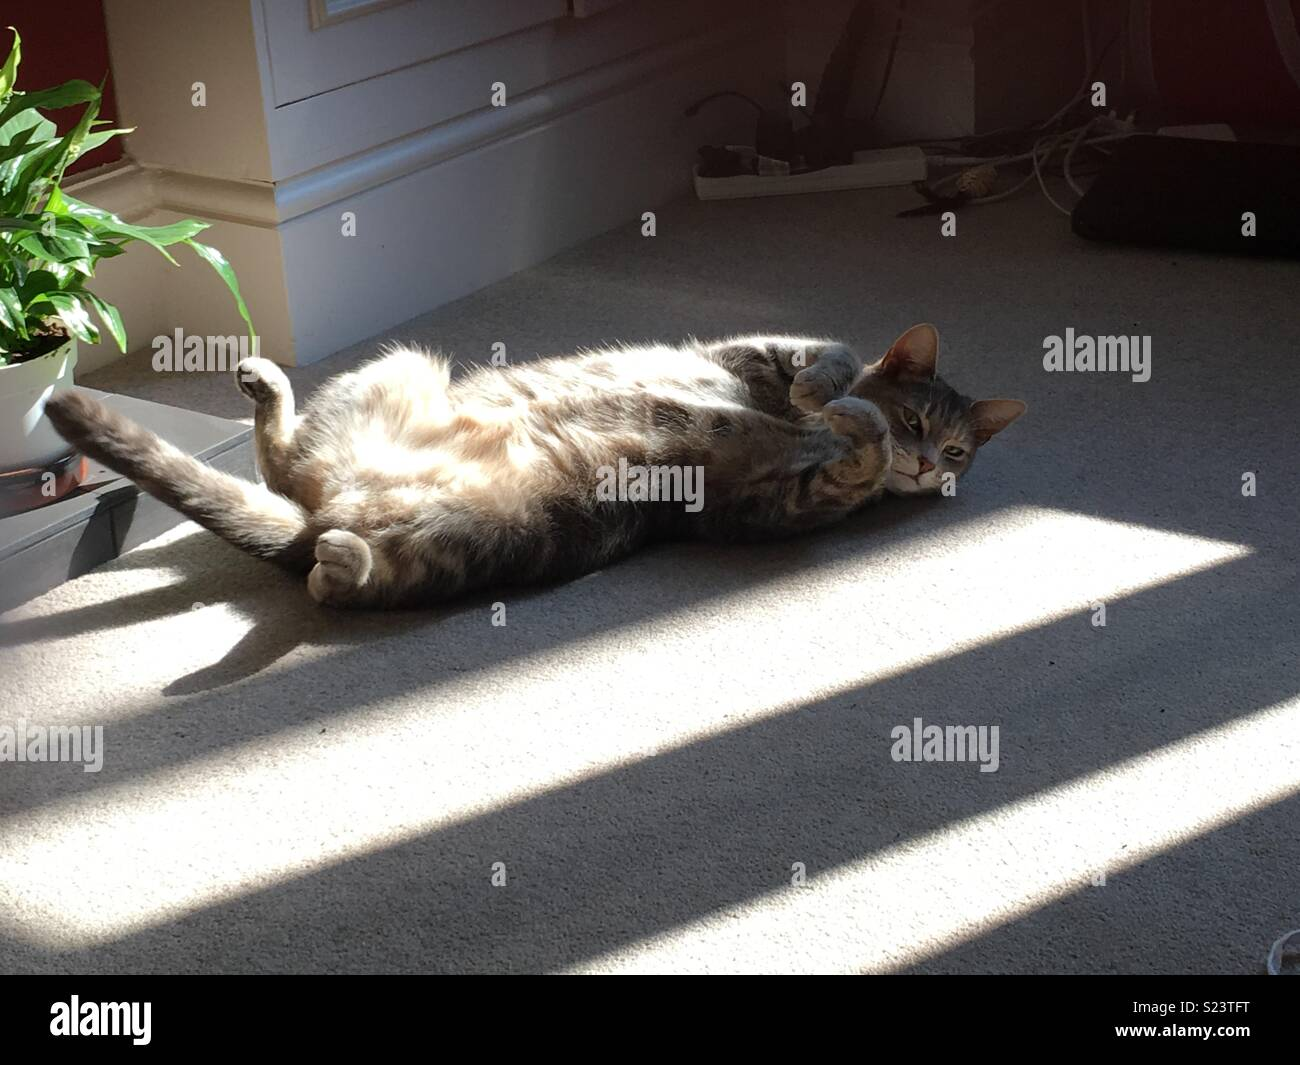 Cat basking in the sunlight - Stock Image